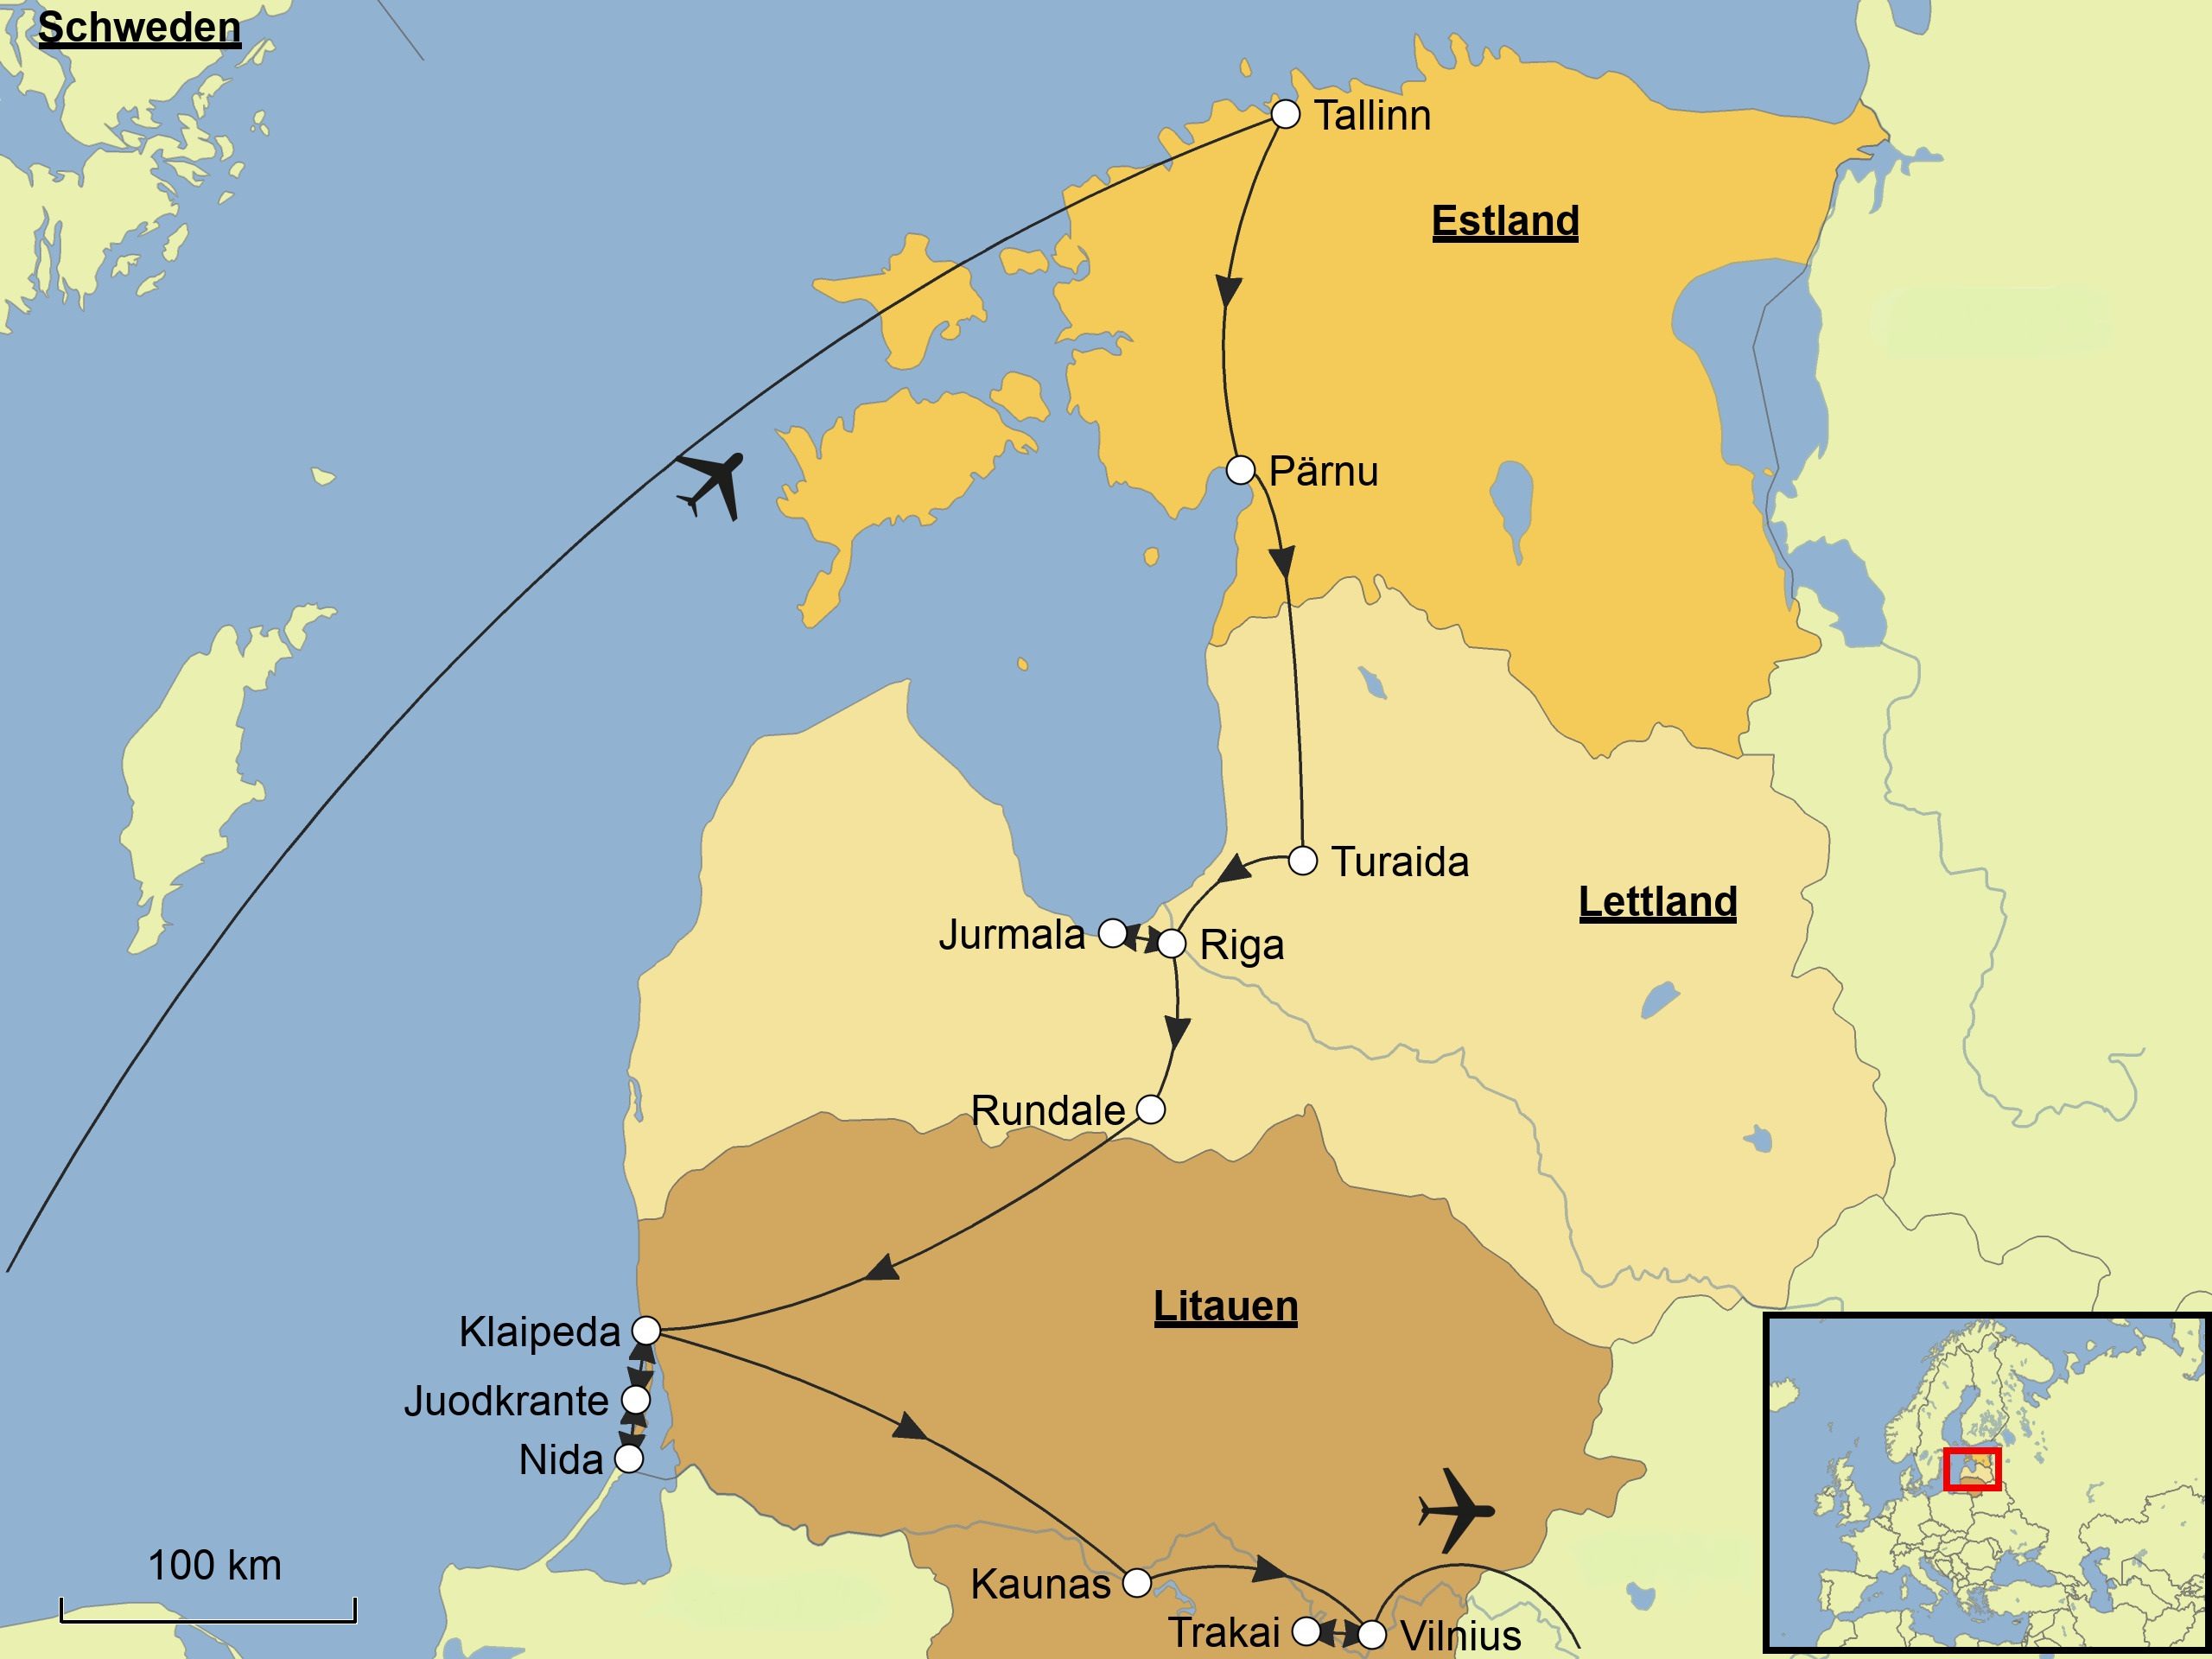 K303274ste Algarve Karte.Karte Estland Lettland